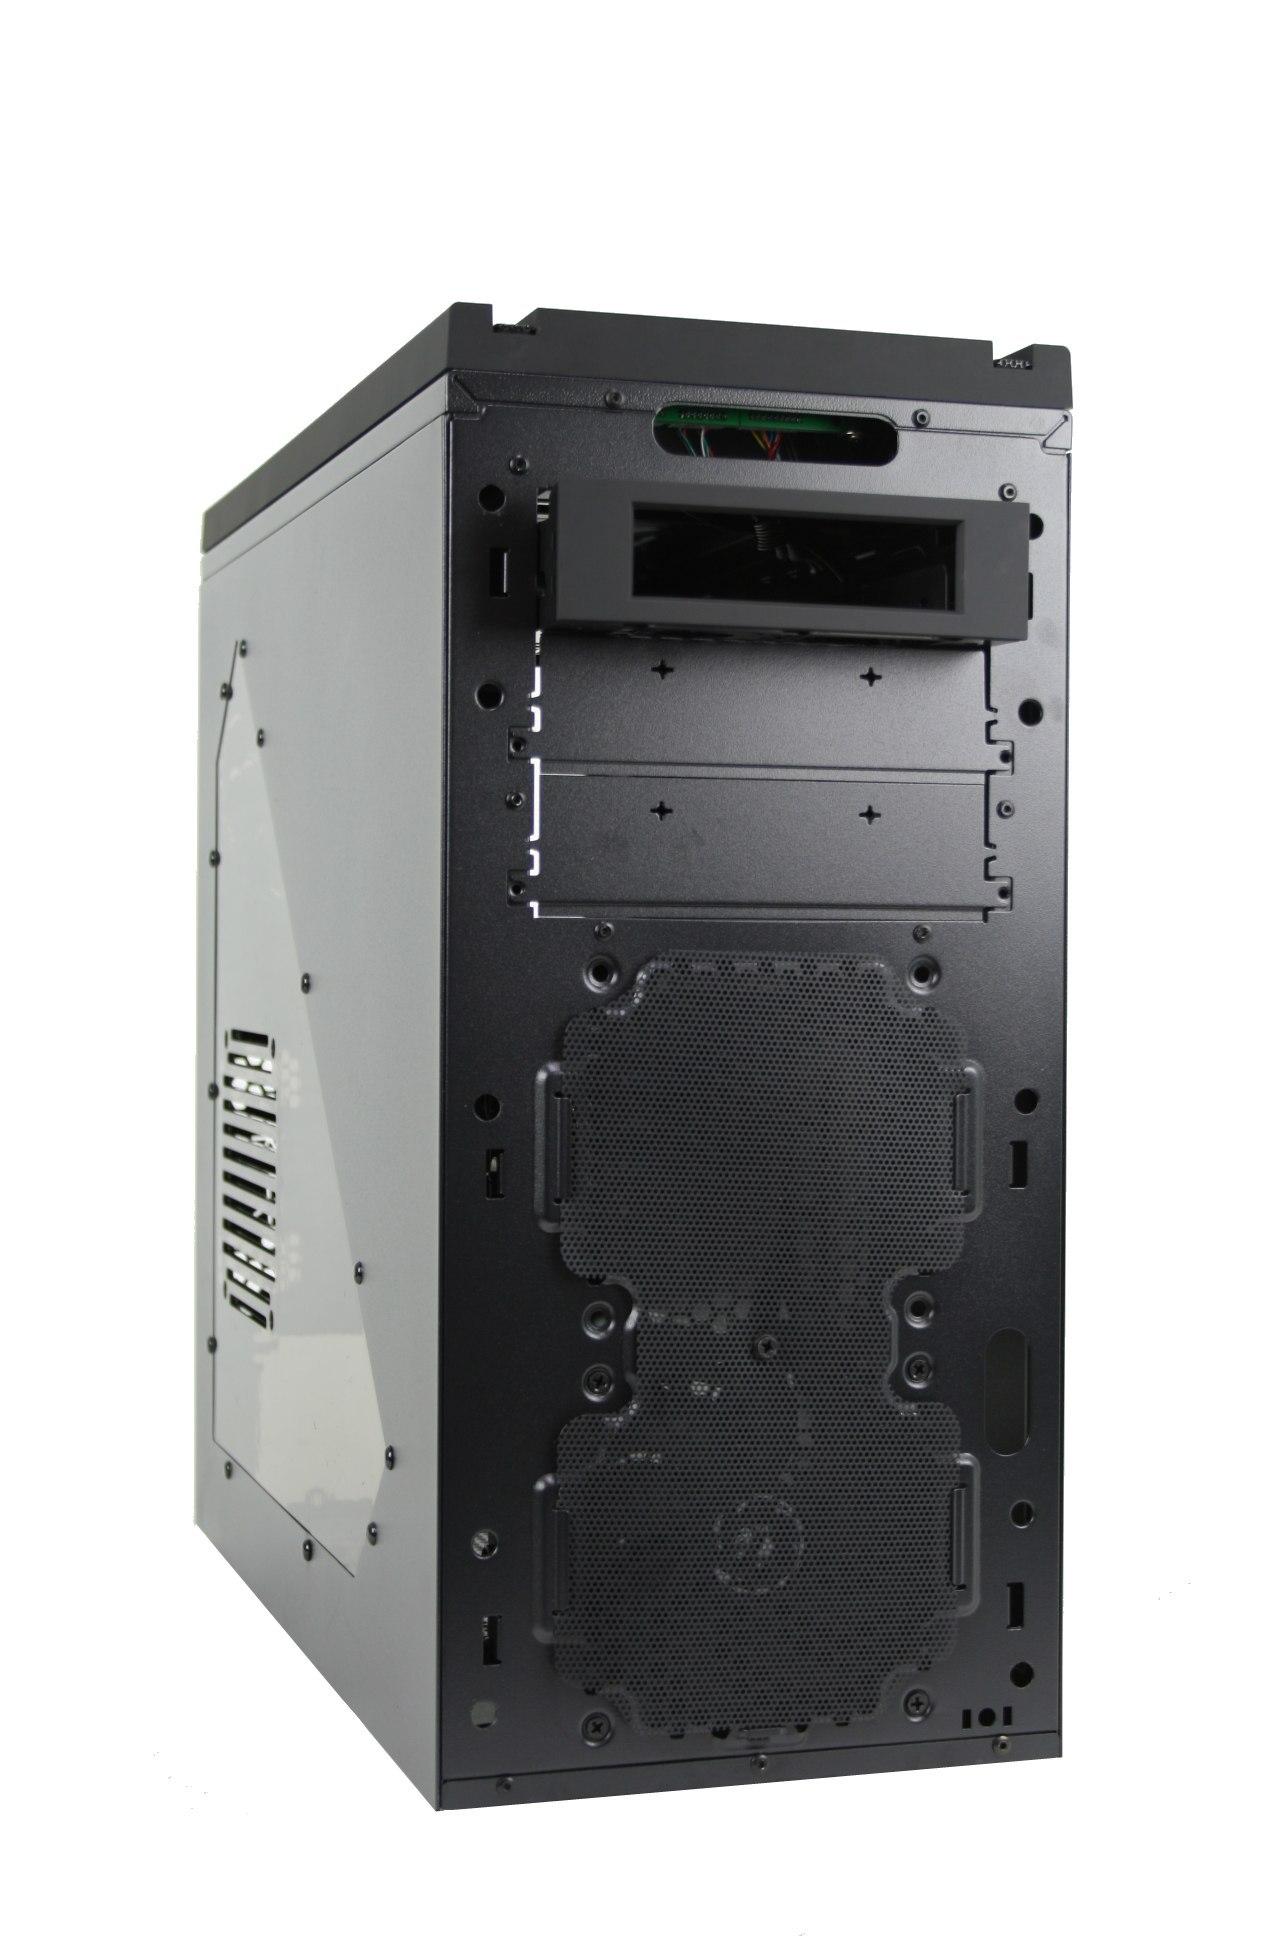 BitFenix Shinobi Black w/ Window front without panel